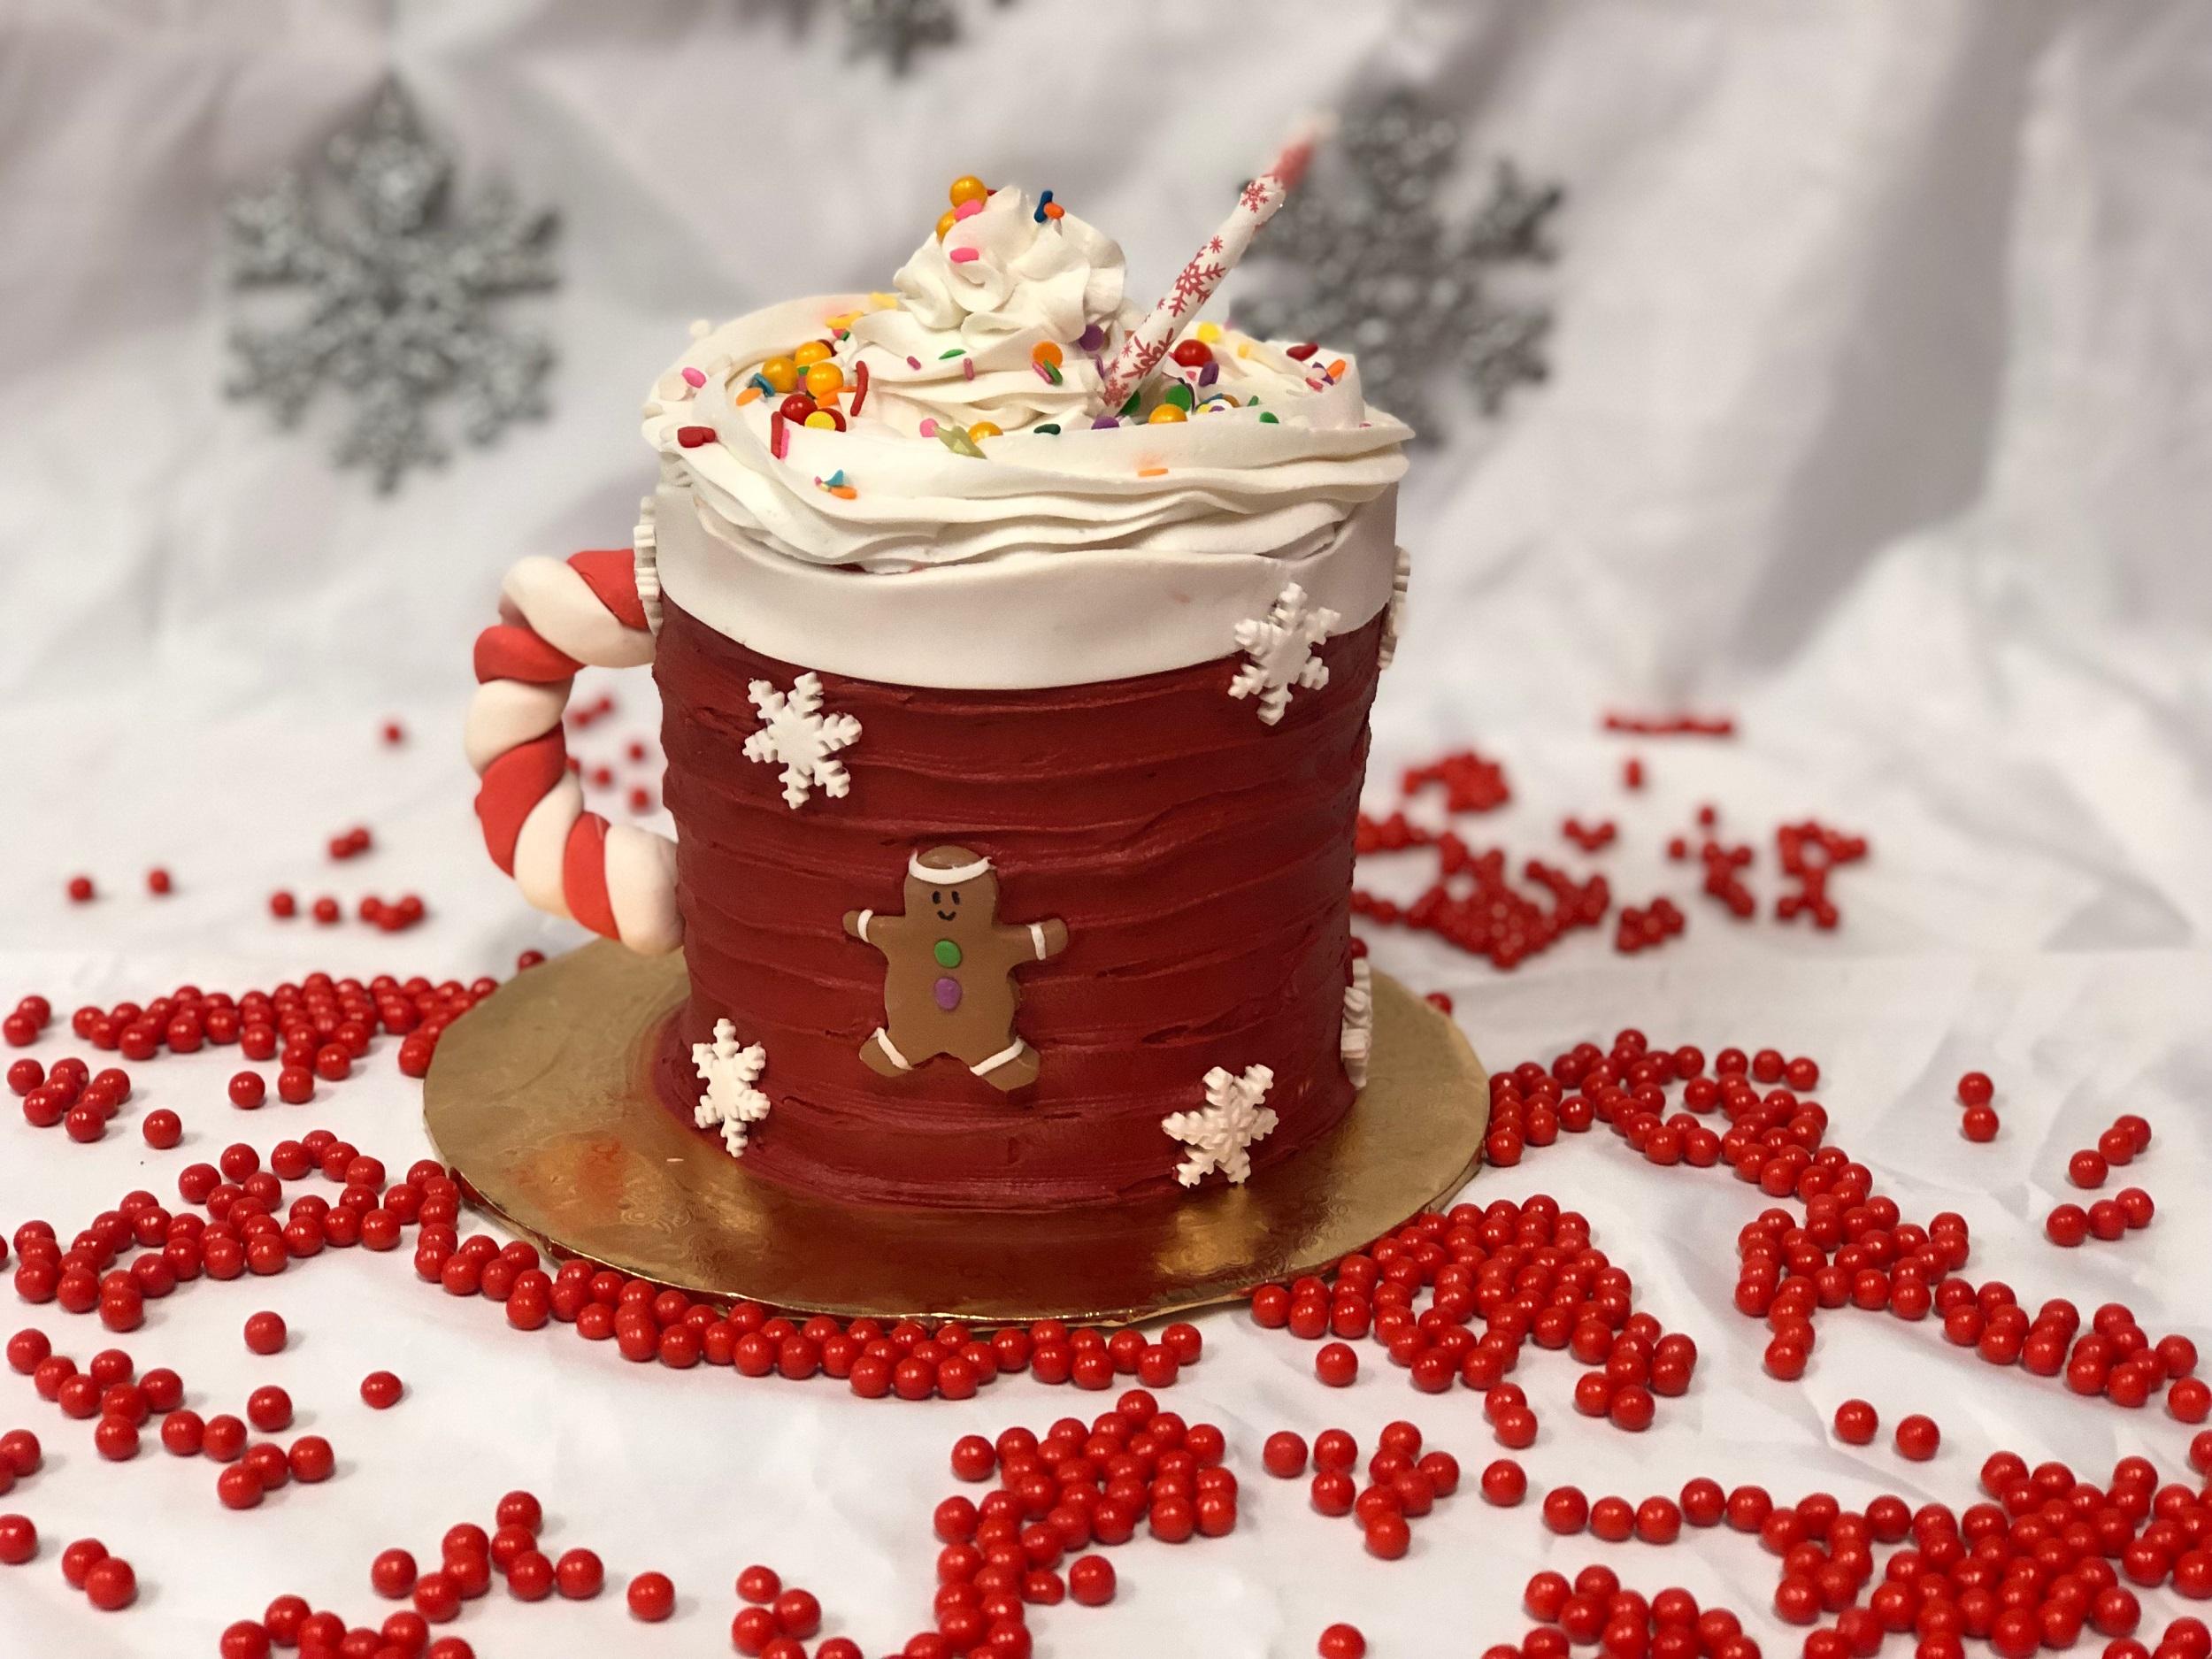 Family Fun Winter Mug Cake Decorating Project